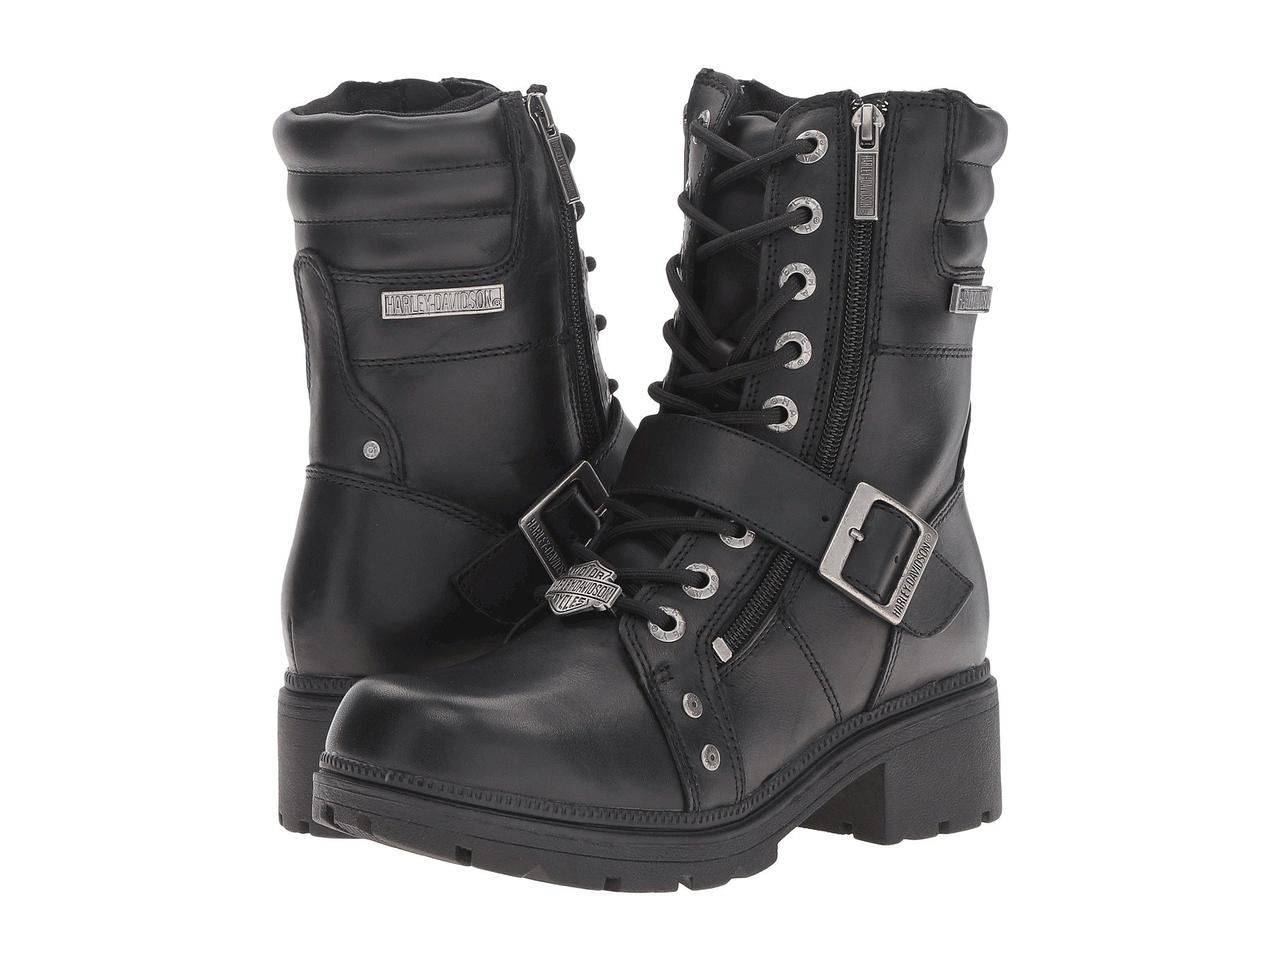 Ботинки/Сапоги (Оригинал) Harley-Davidson Talley Ridge Black